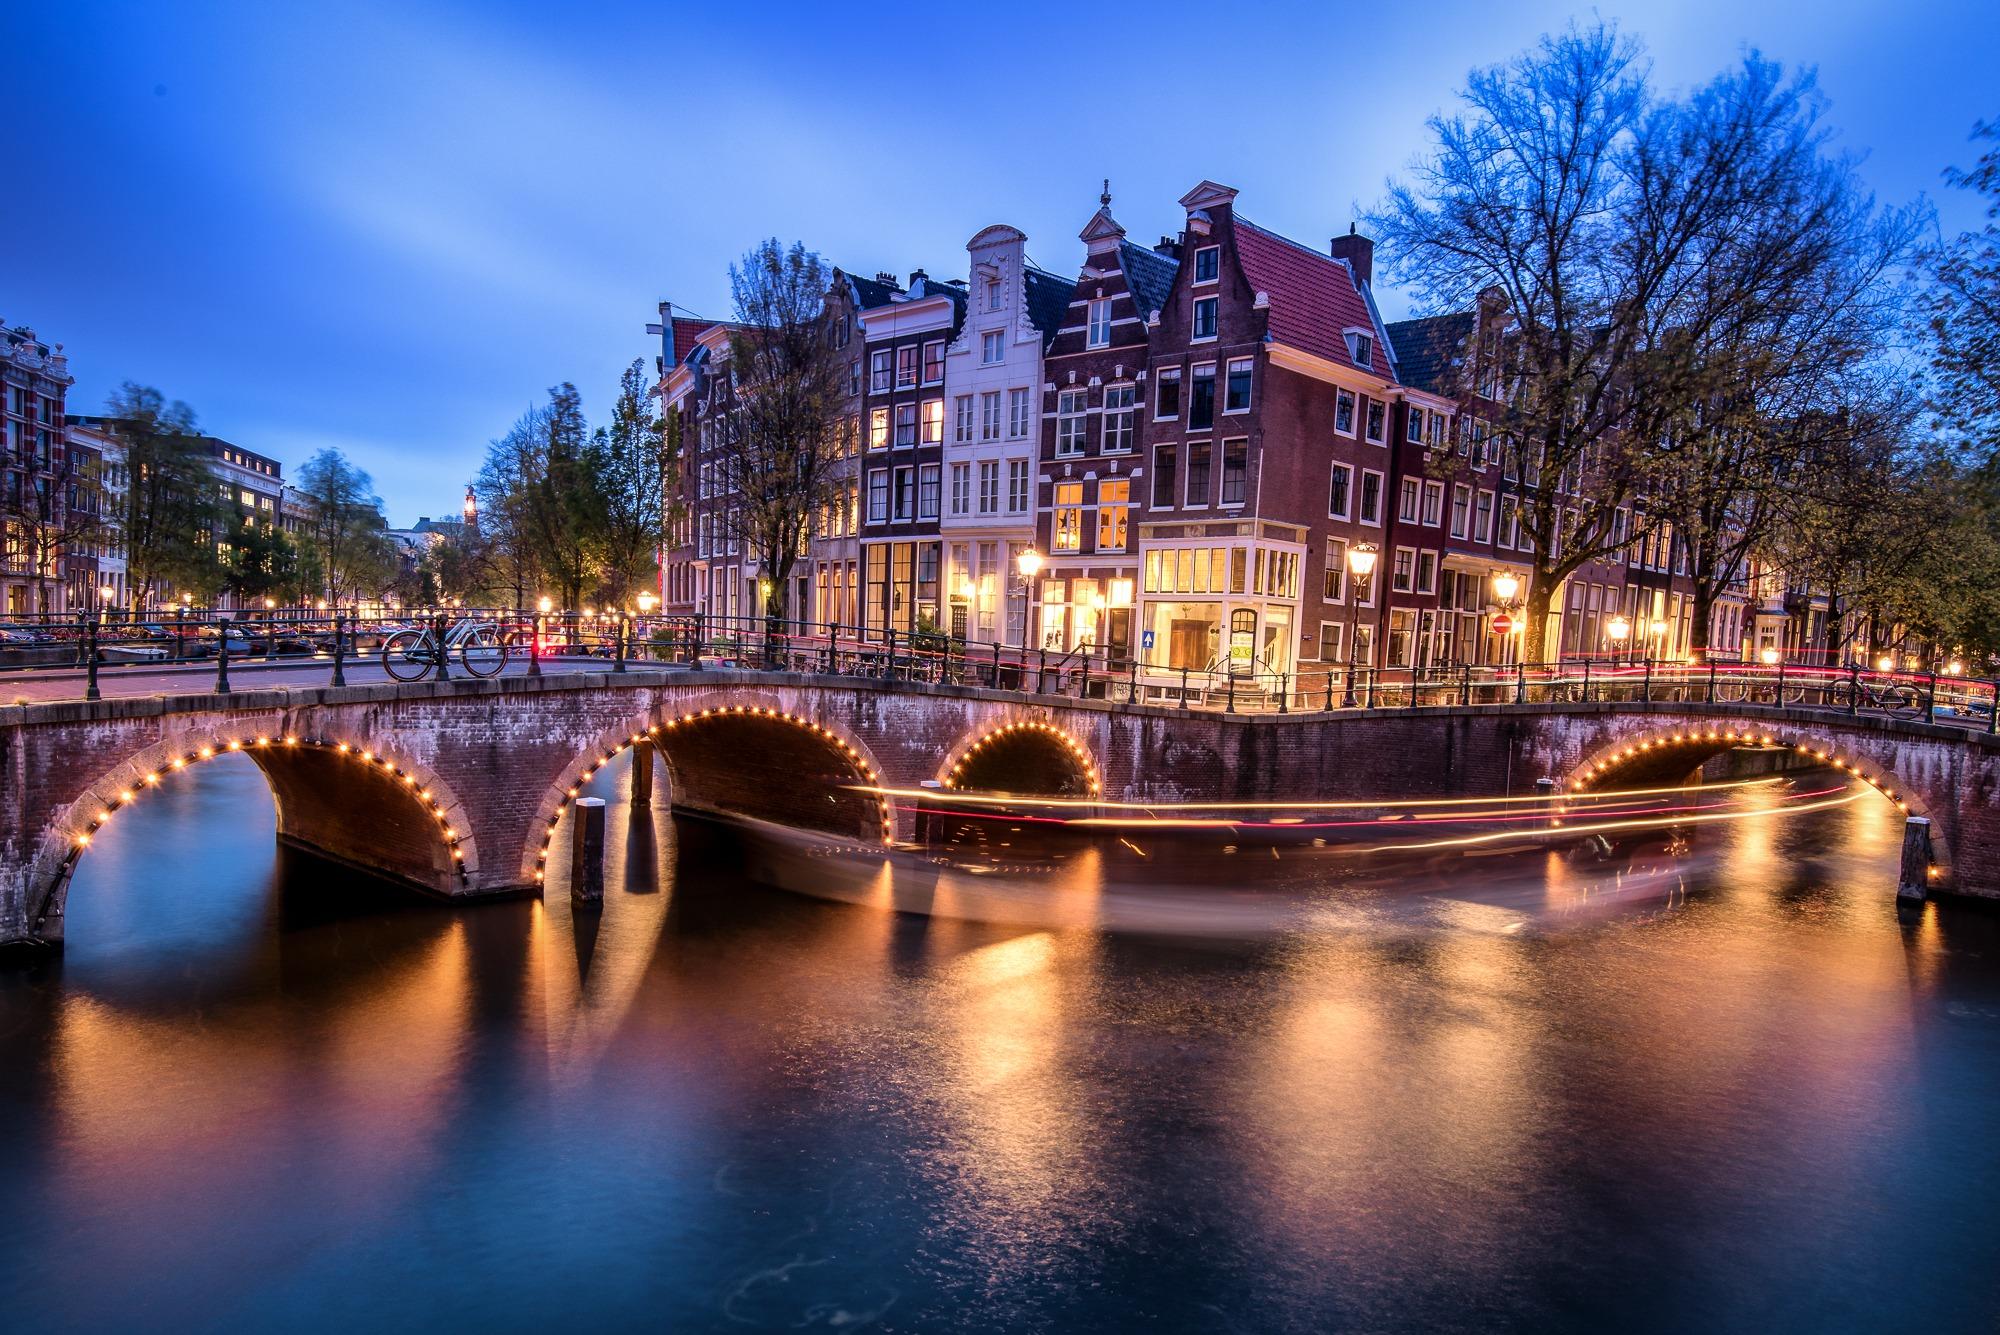 holland amsterdam canal